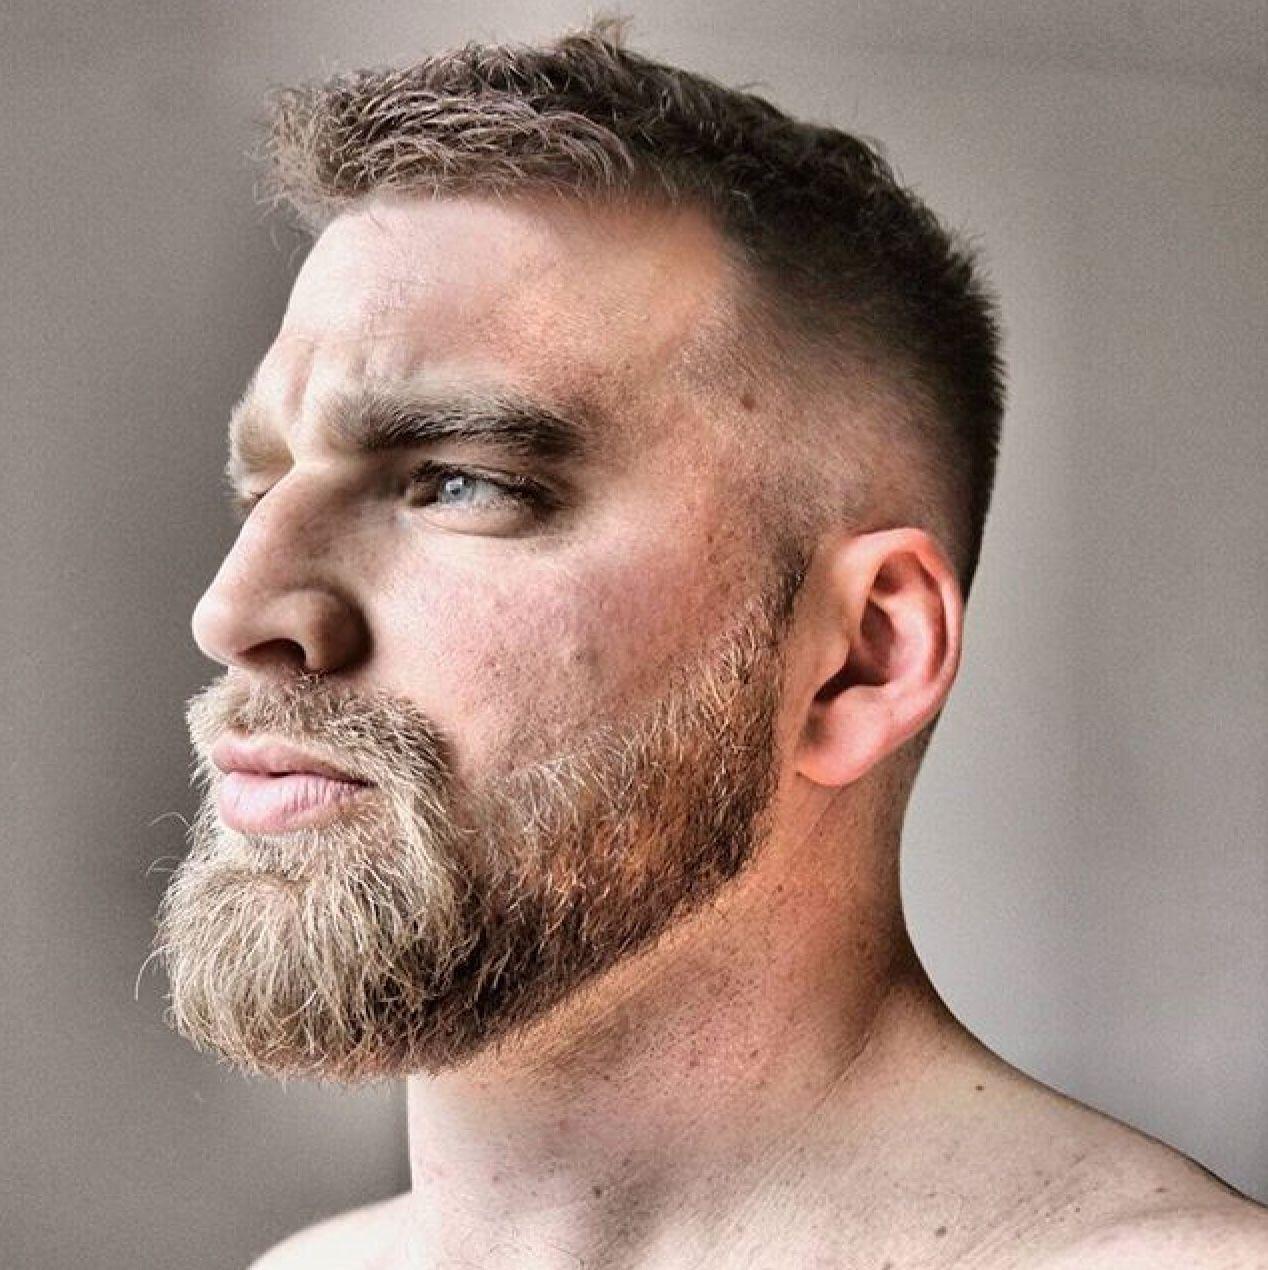 Beardo Beard No Mustache Beard Haircut Mens Facial Hair Styles